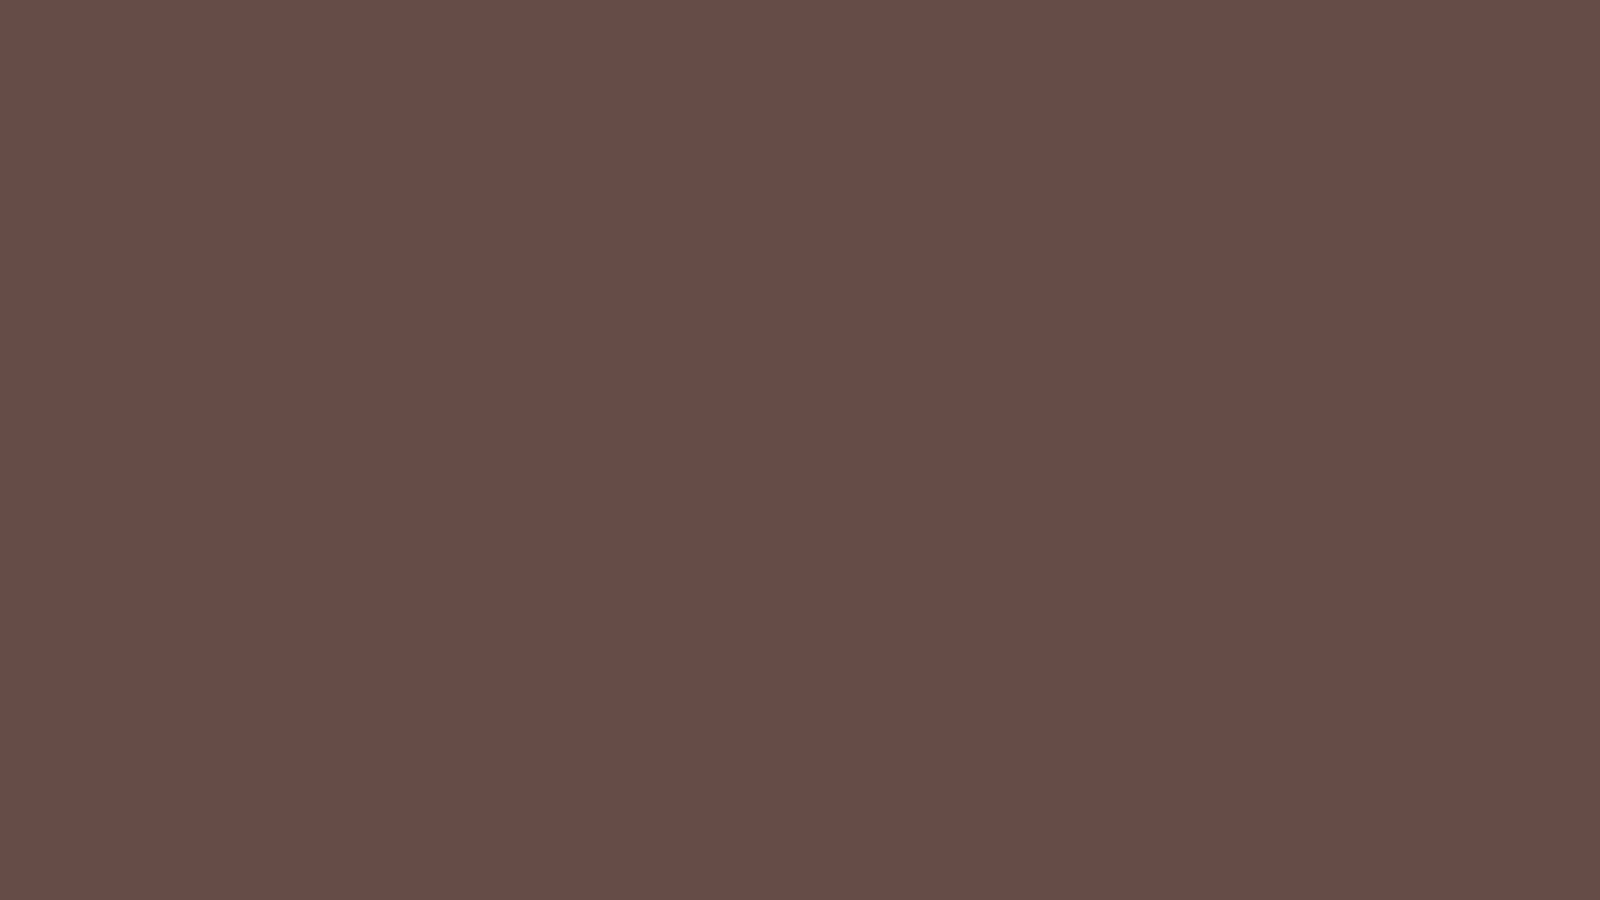 1600x900 Liver Solid Color Background